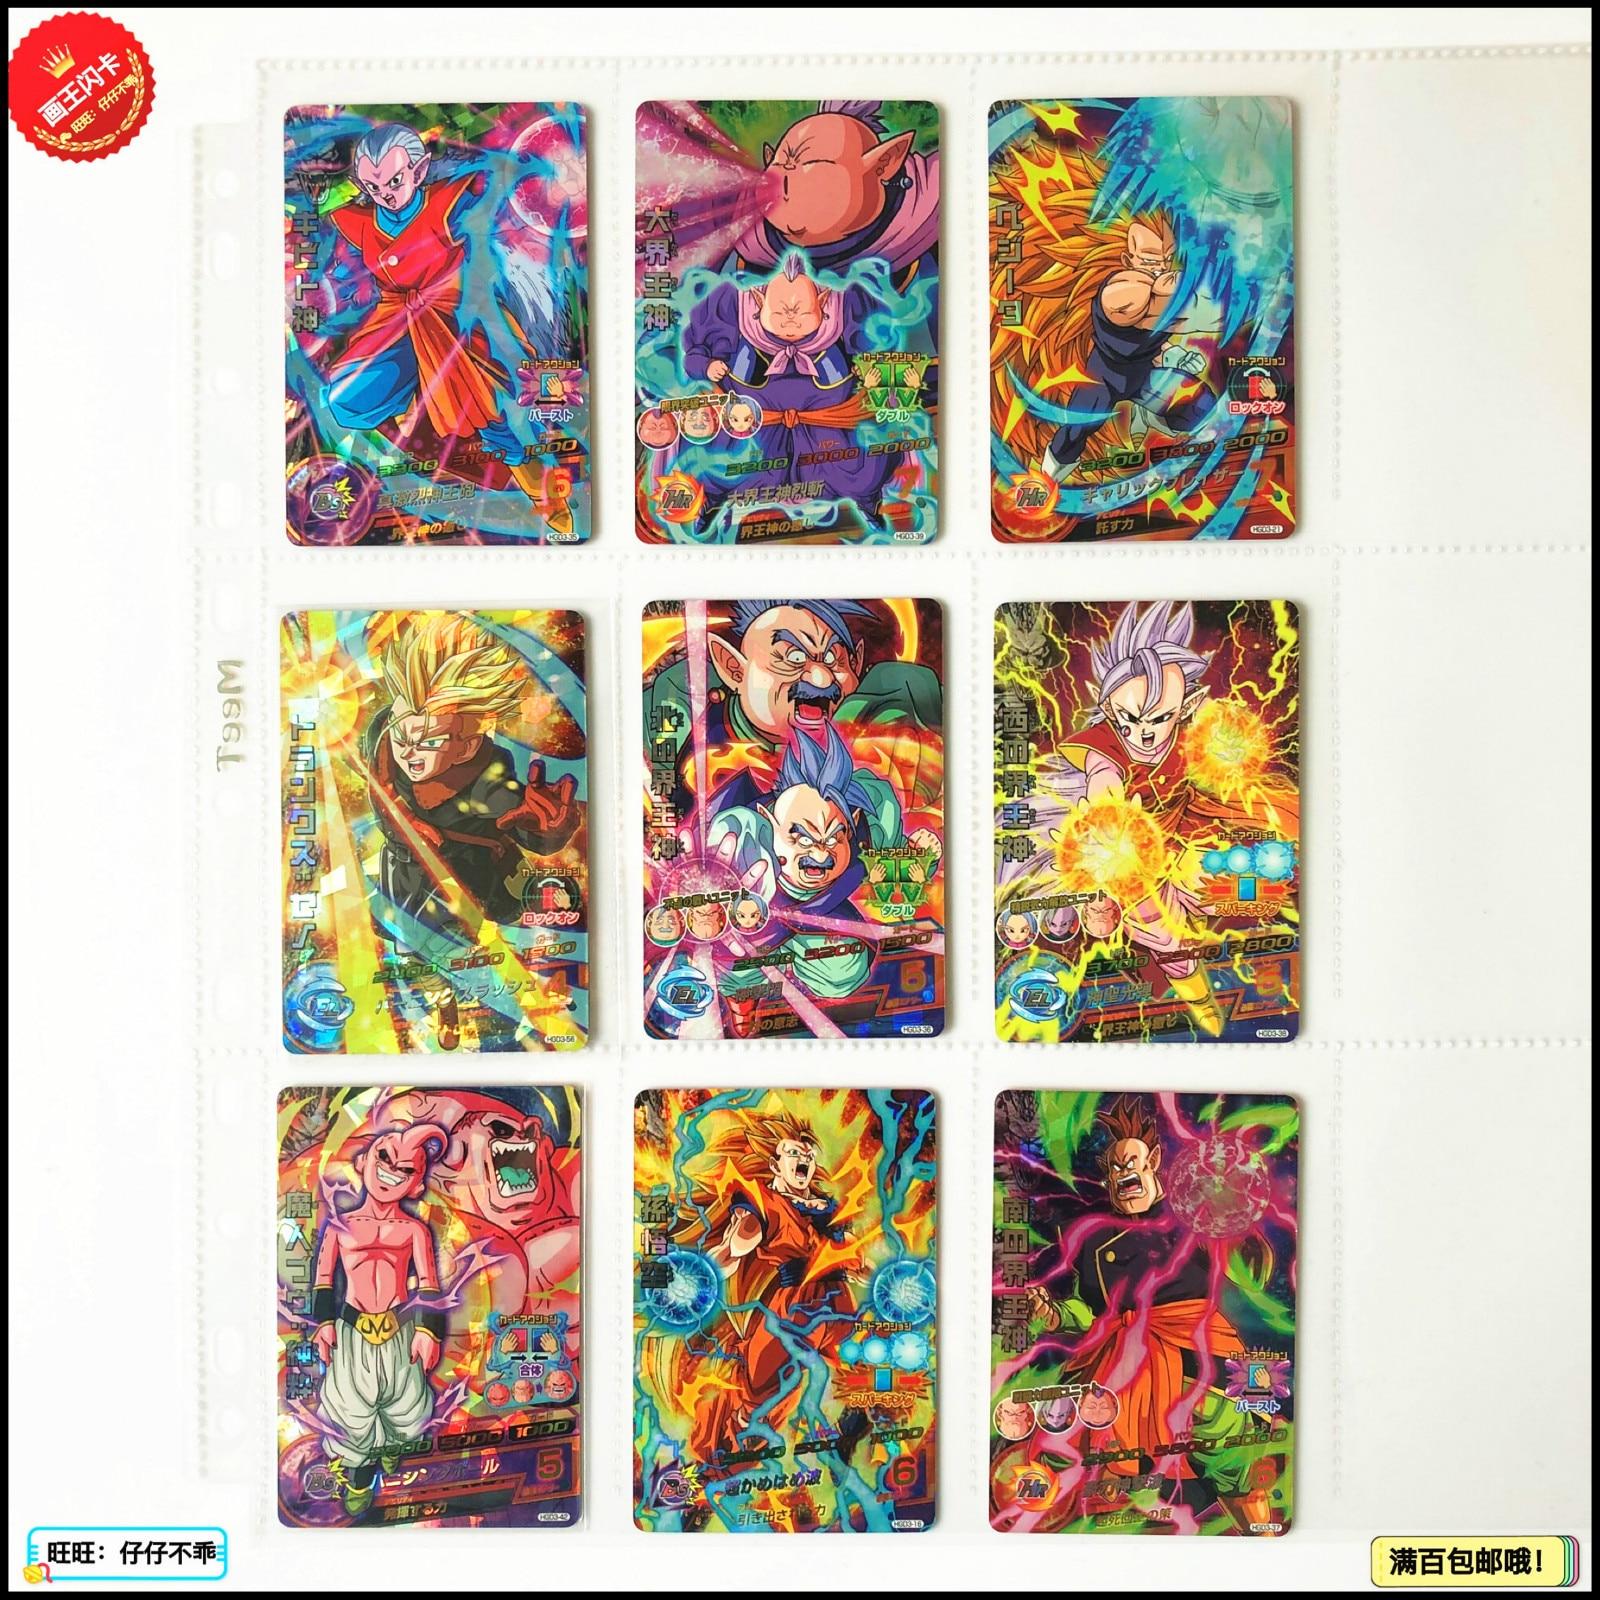 Japan Original Dragon Ball Hero Card SR Flash 3 Stars HGD3 Goku Toys Hobbies Collectibles Game Collection Anime Cards